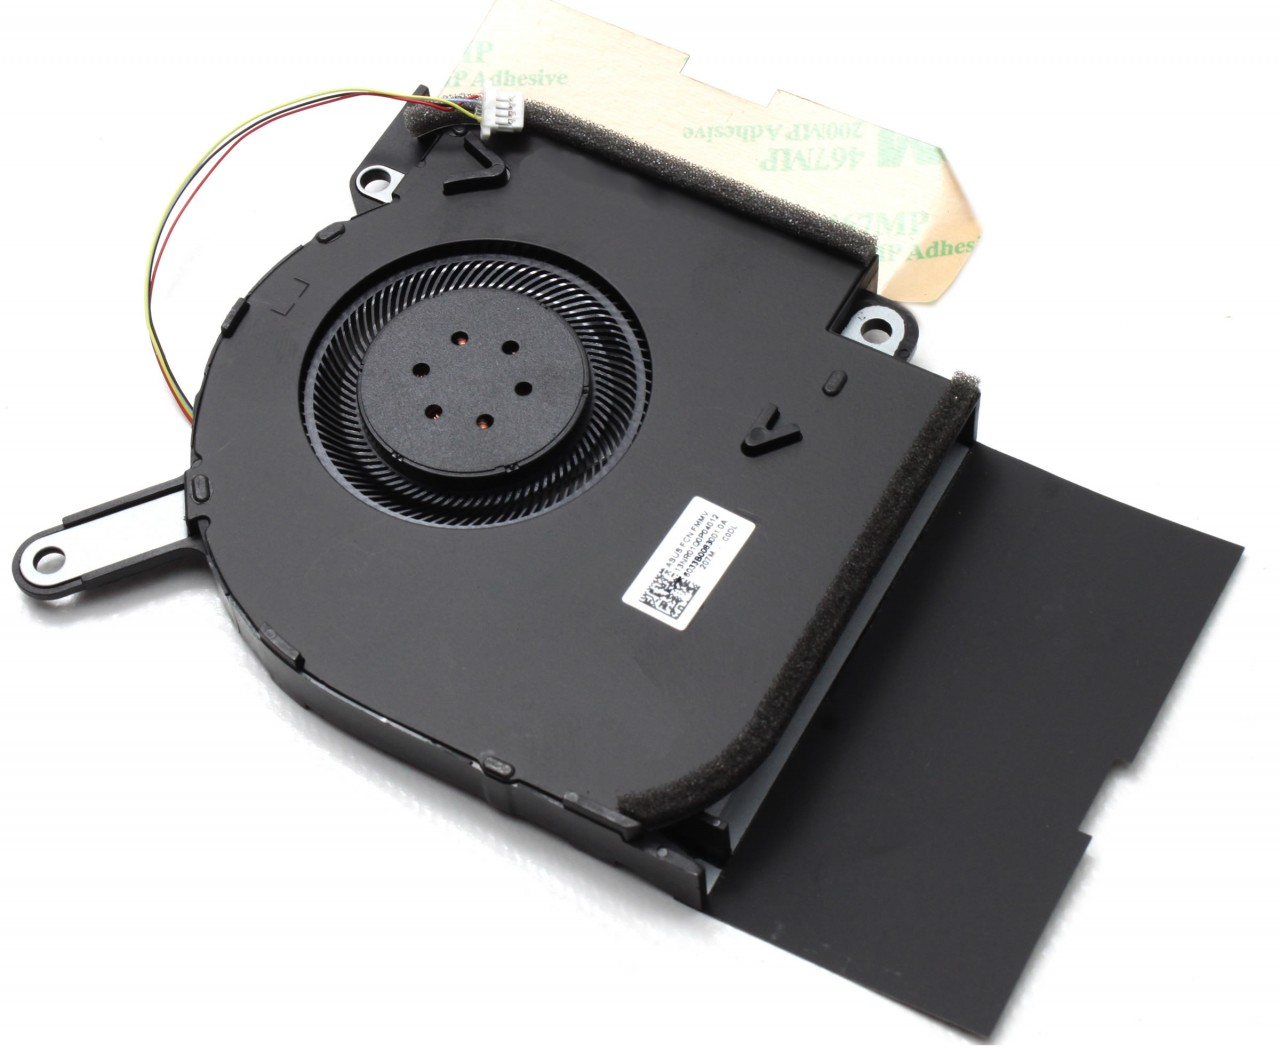 Cooler placa video laptop GPU Asus DFSCK22115181L 12V imagine powerlaptop.ro 2021